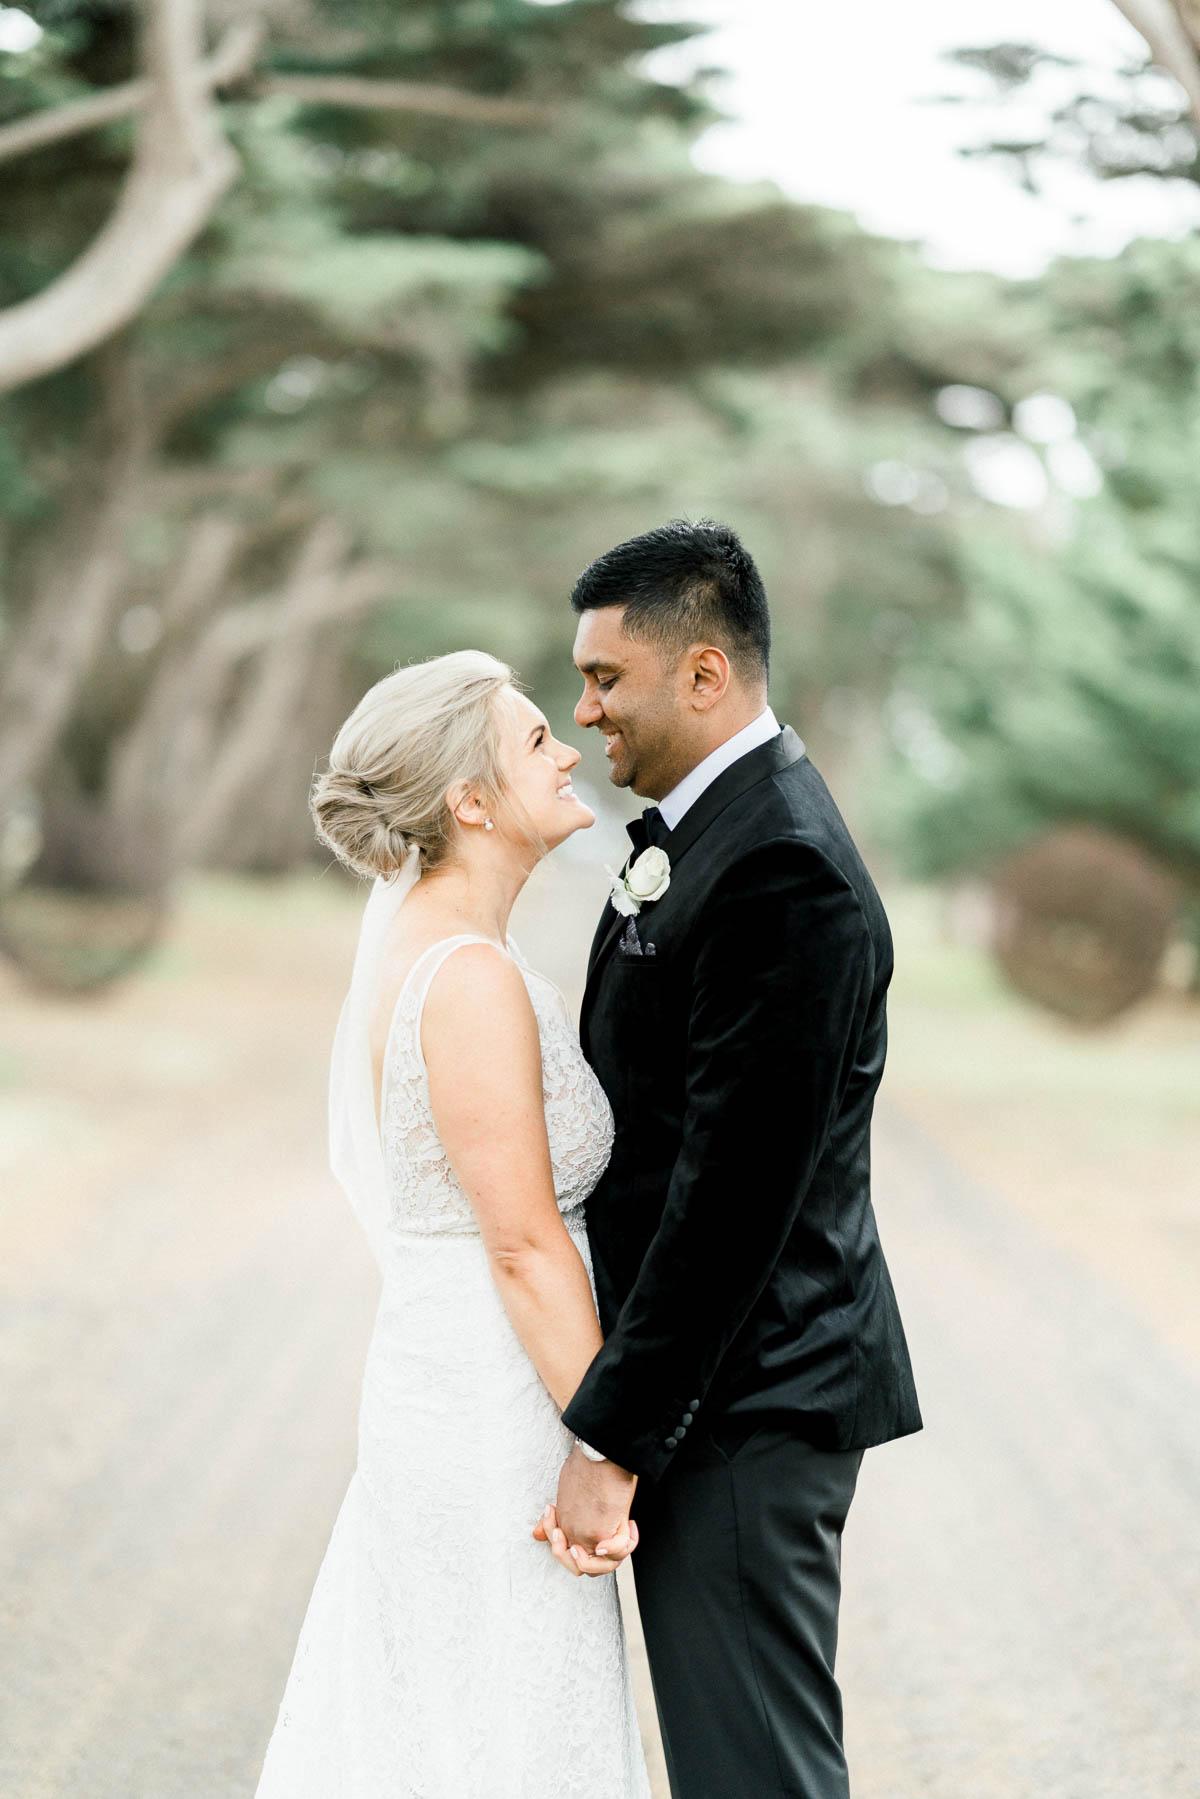 trenavin-chapel-phillip-island-wedding-heart+soul-weddings-sally-sean-01450.jpg